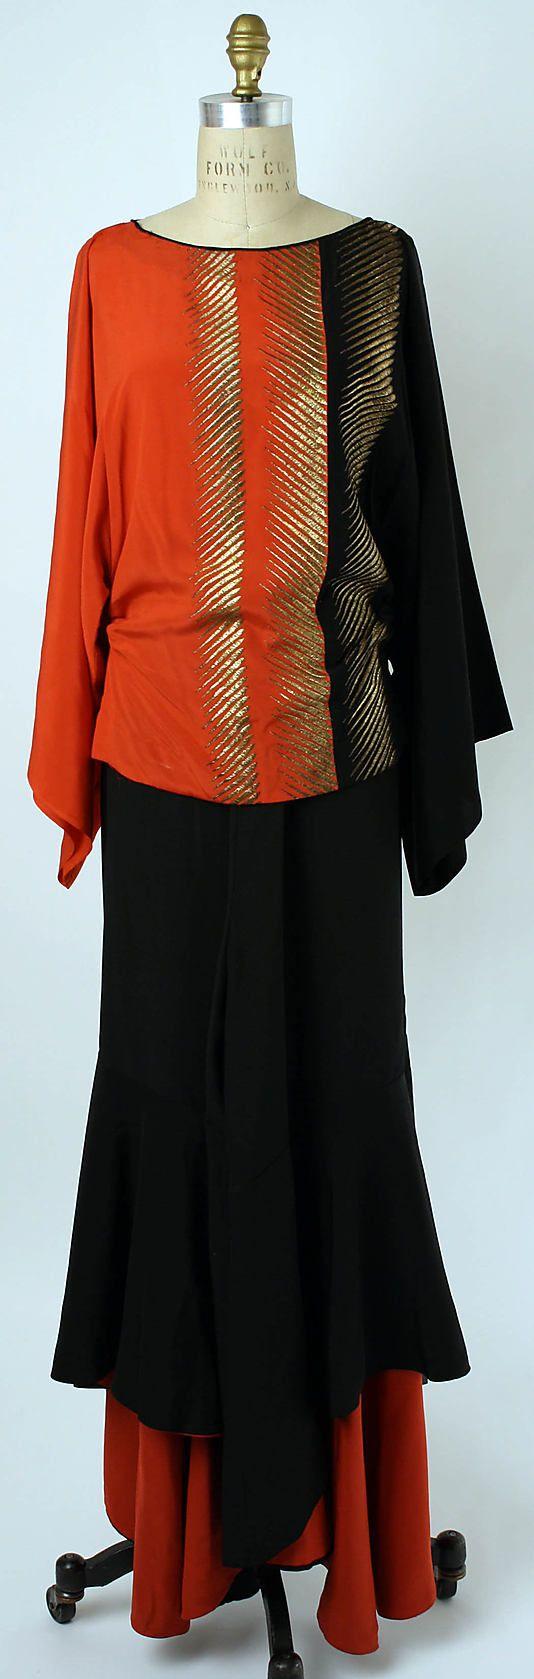 Lounging Pajamas, Edward Molyneux, 1932. silk and metallic thread. Image via Pinterest.